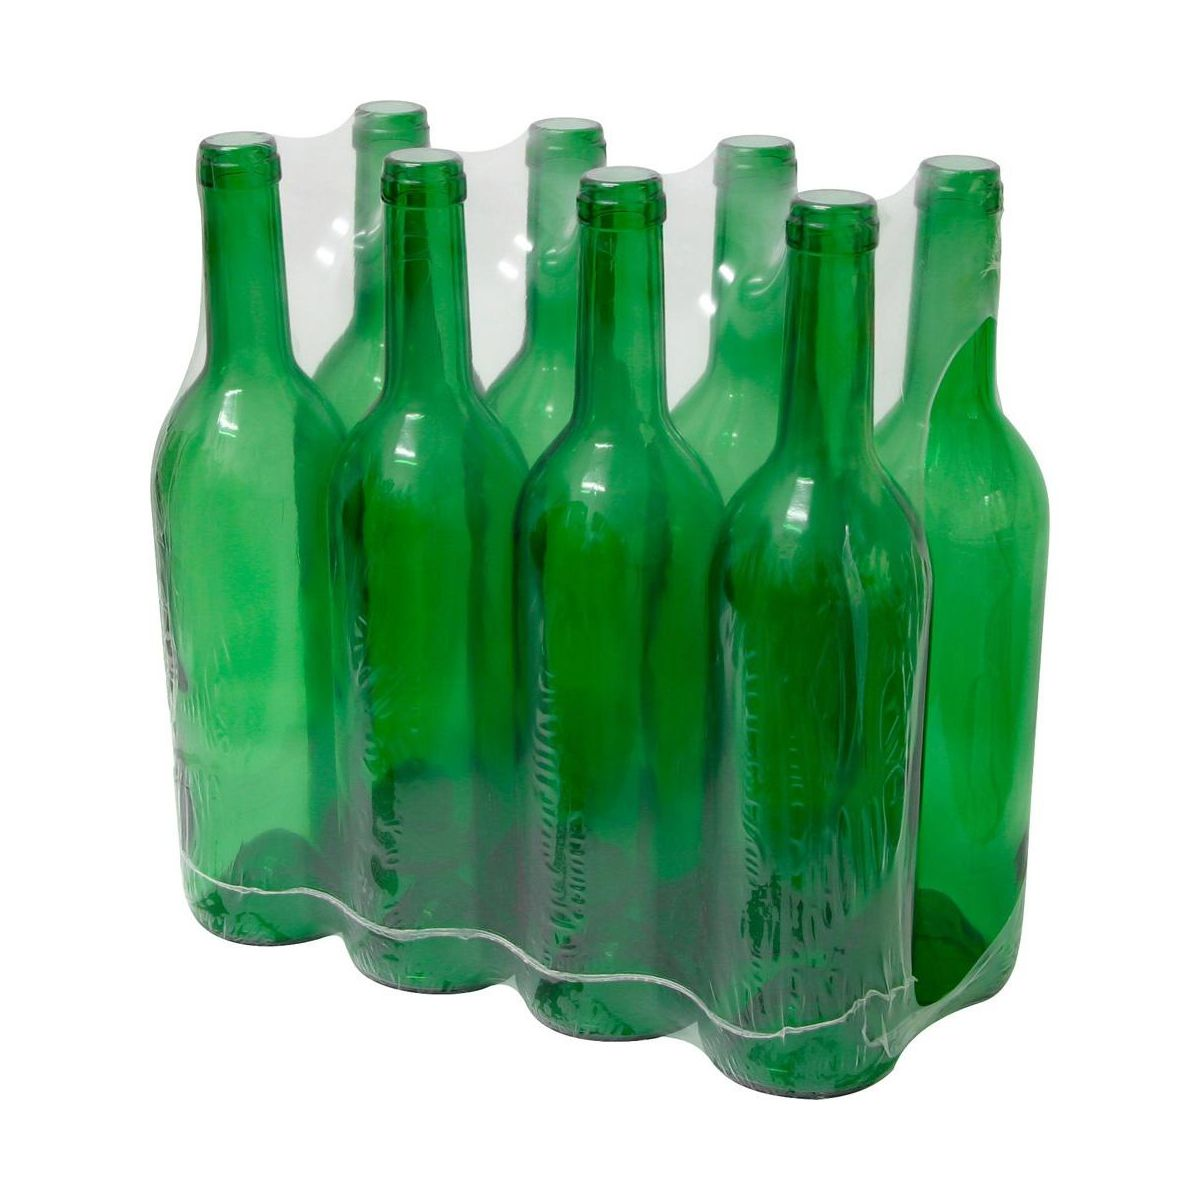 Butelka szklana zielona 0.75 l BIOWIN